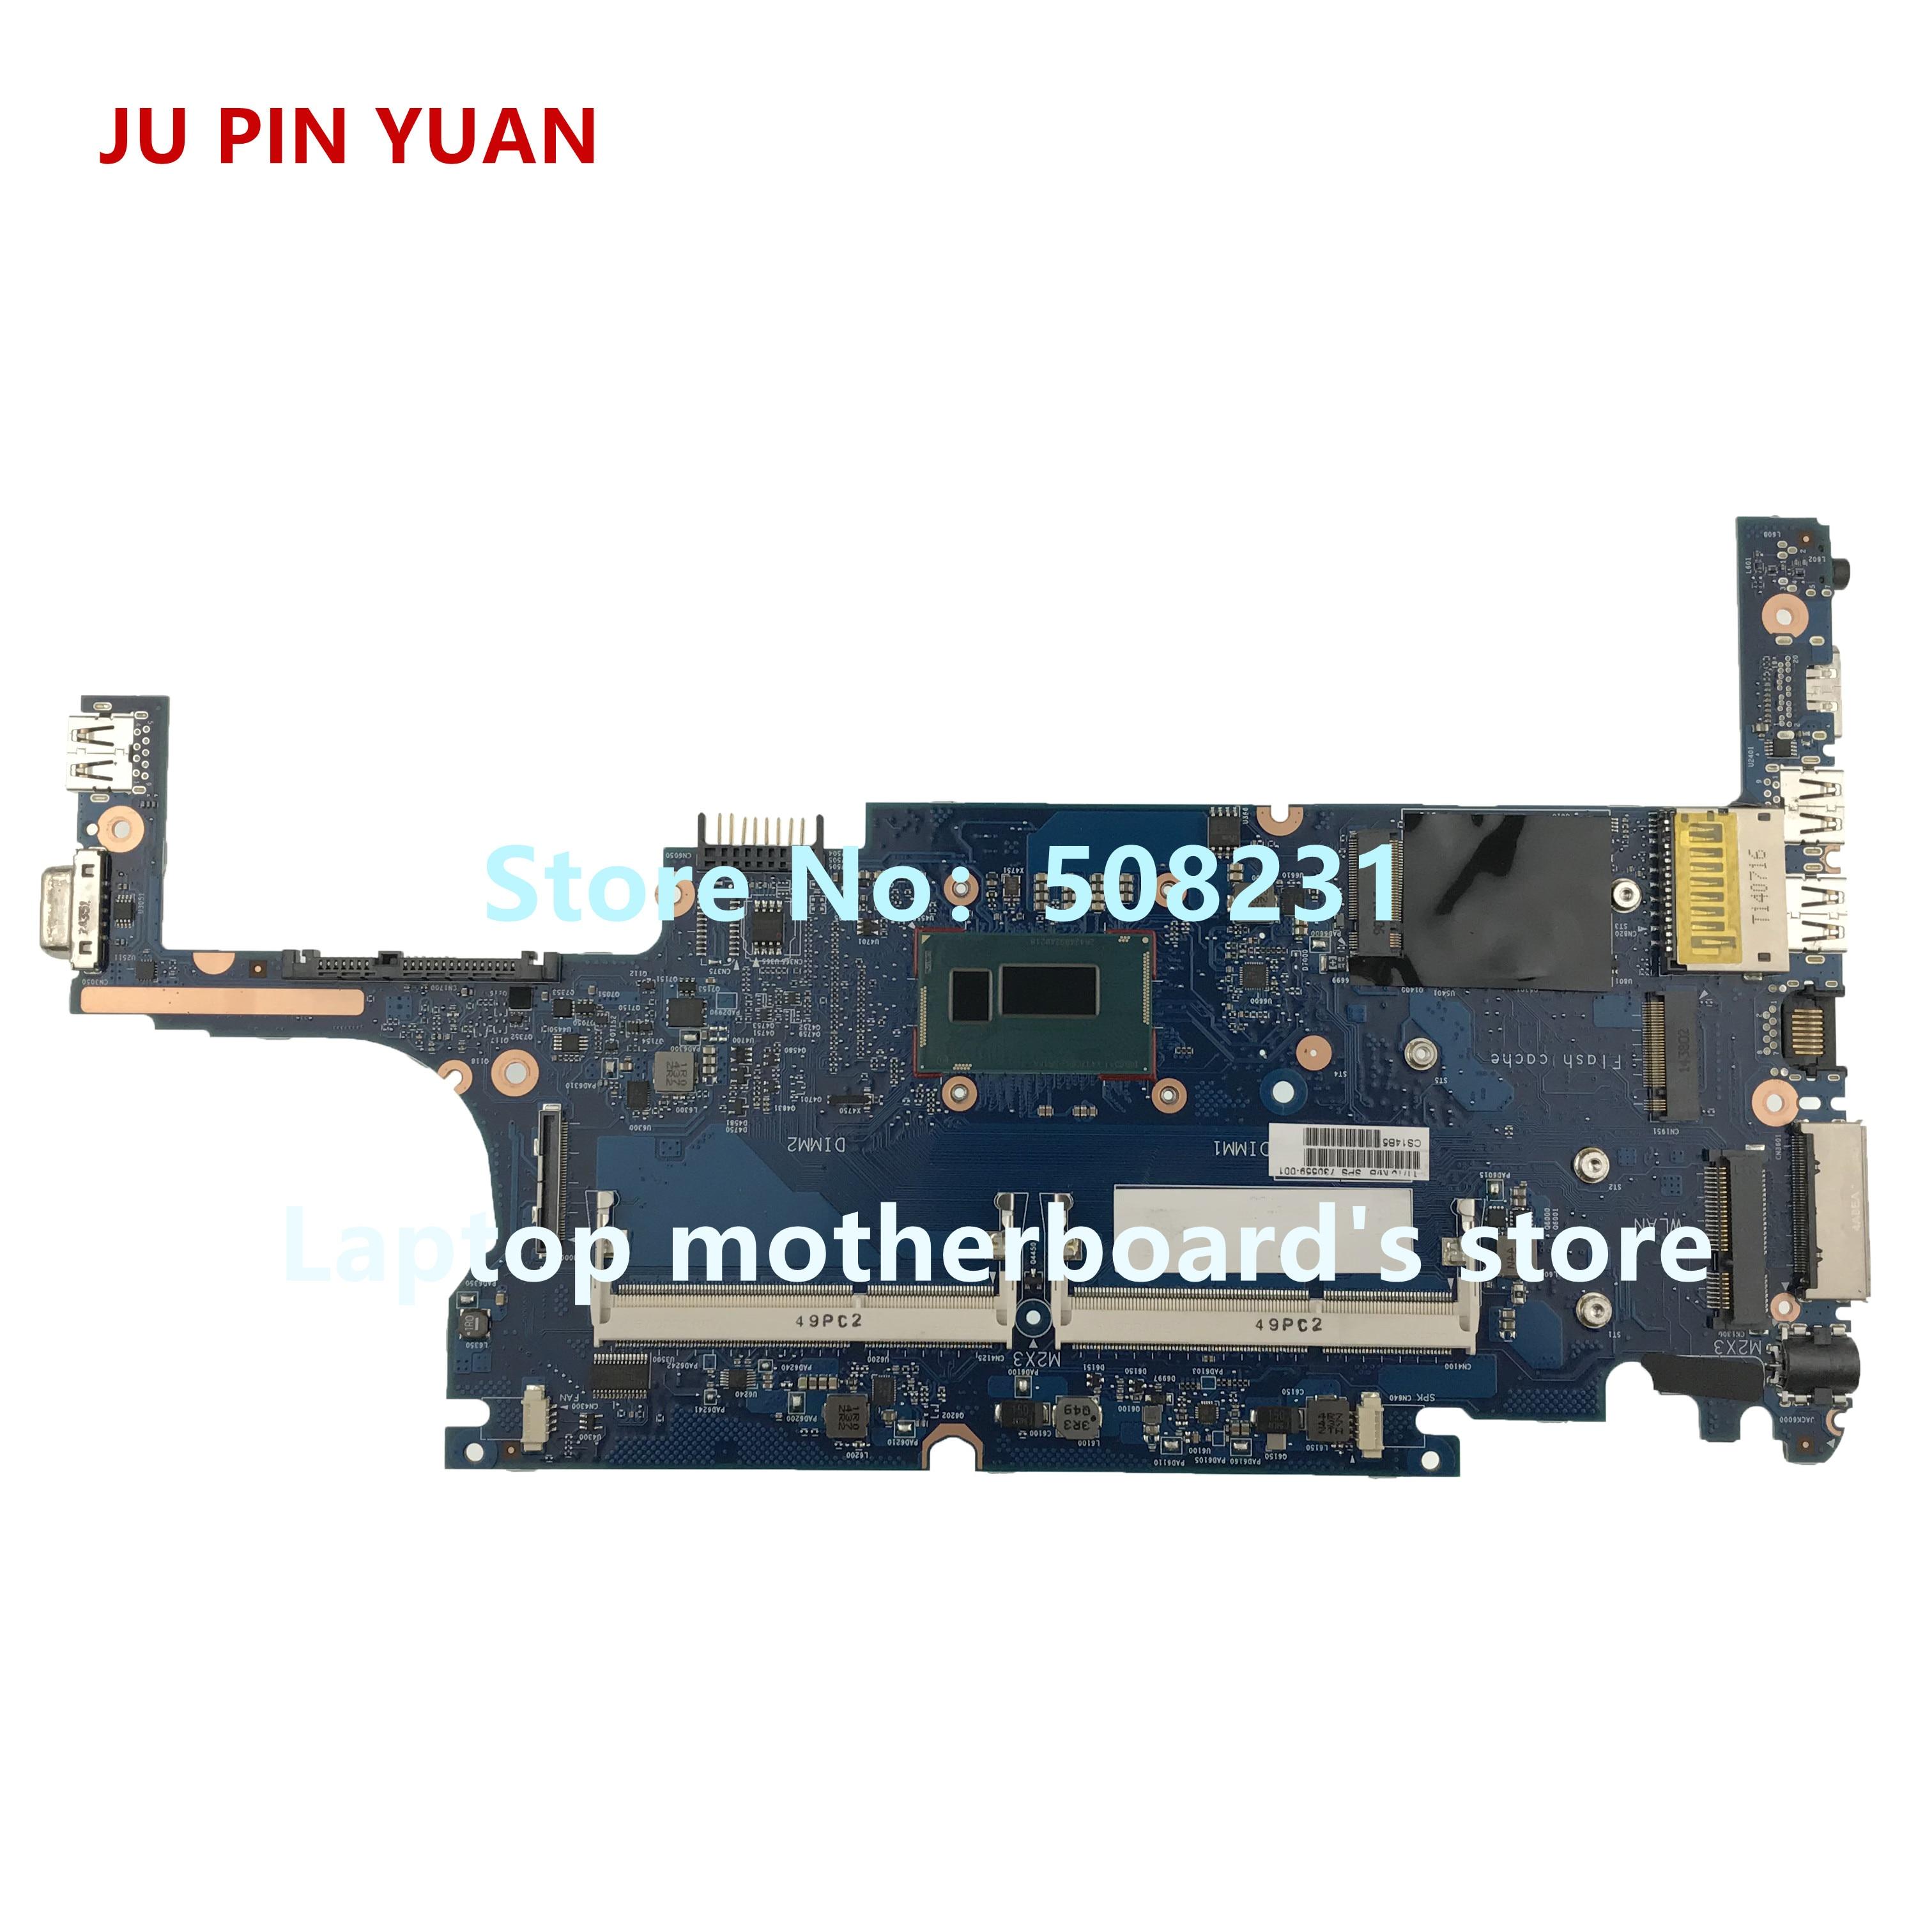 JU PIN YUAN para HP 820 G1 placa base de computadora portátil 730559-001 730559-501, 730559-601, con i7-4600U 100% probado completamente